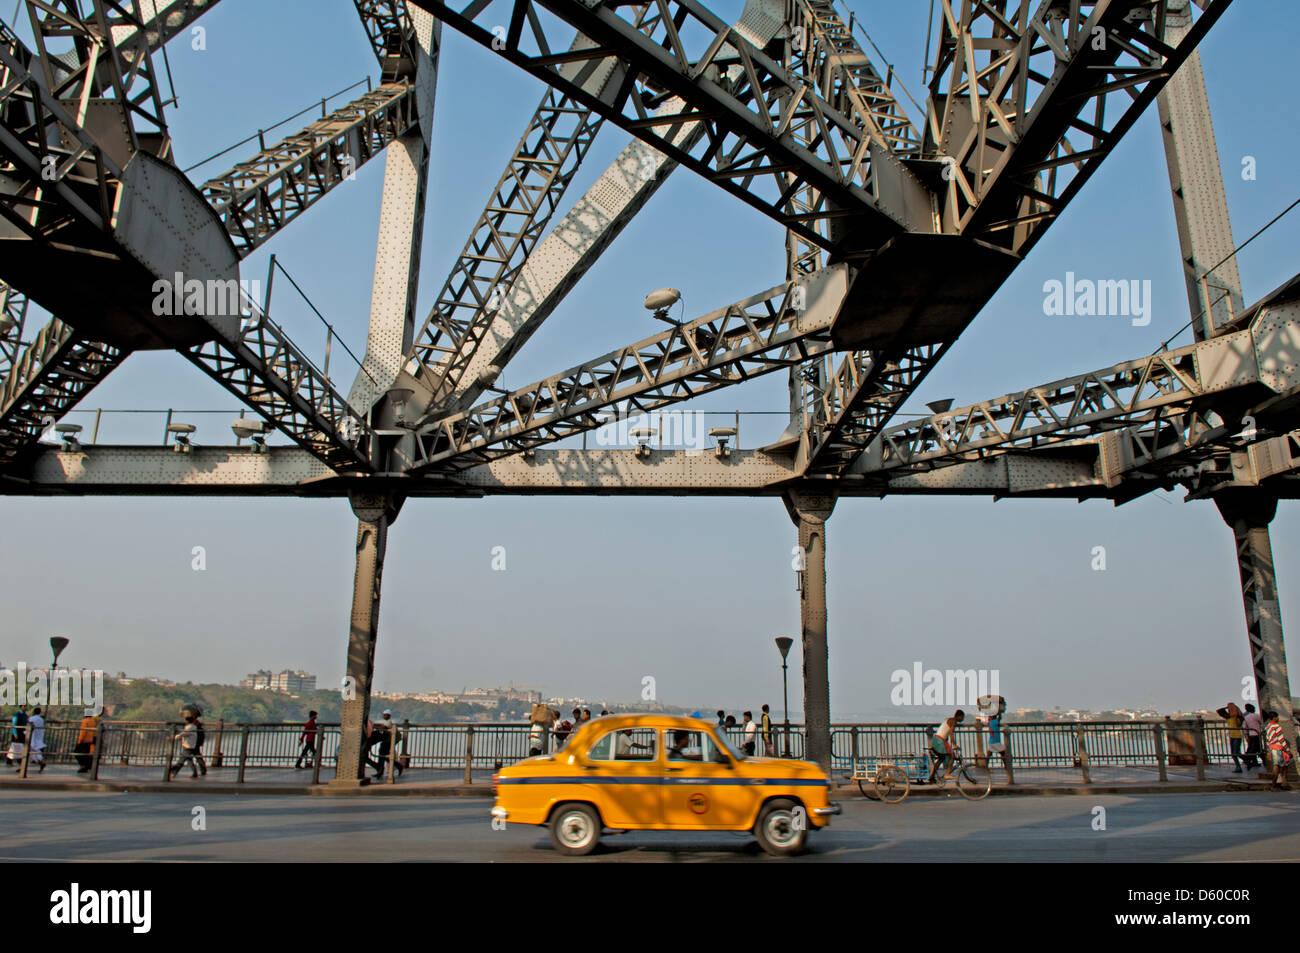 a taxi passes by on the howrath bridge, kolkata, india - Stock Image